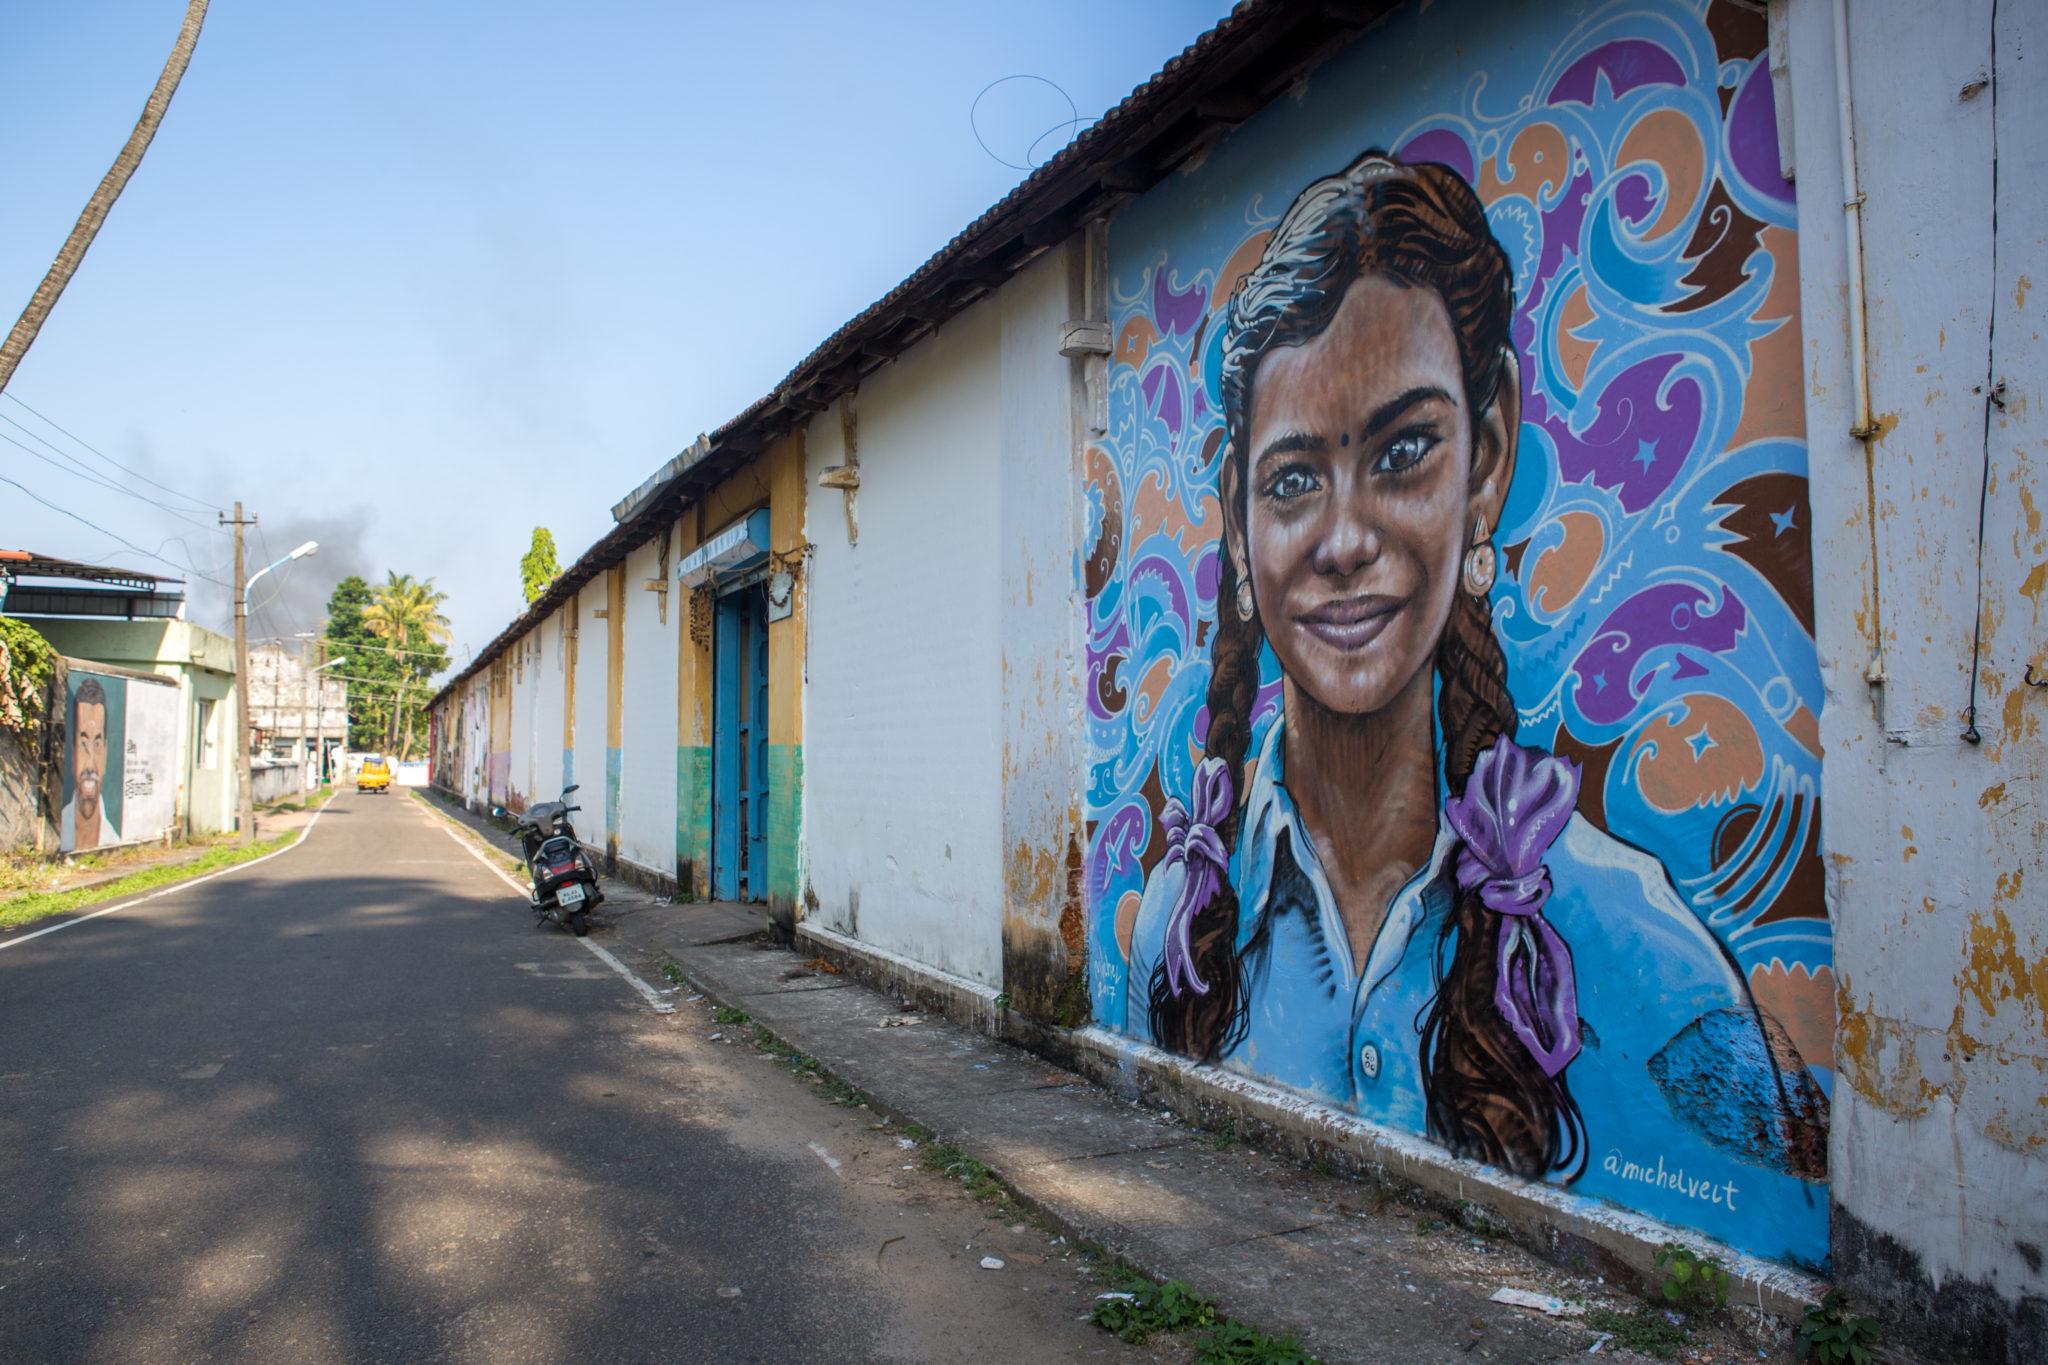 streetart-cochin-inde-visite-city-kerala